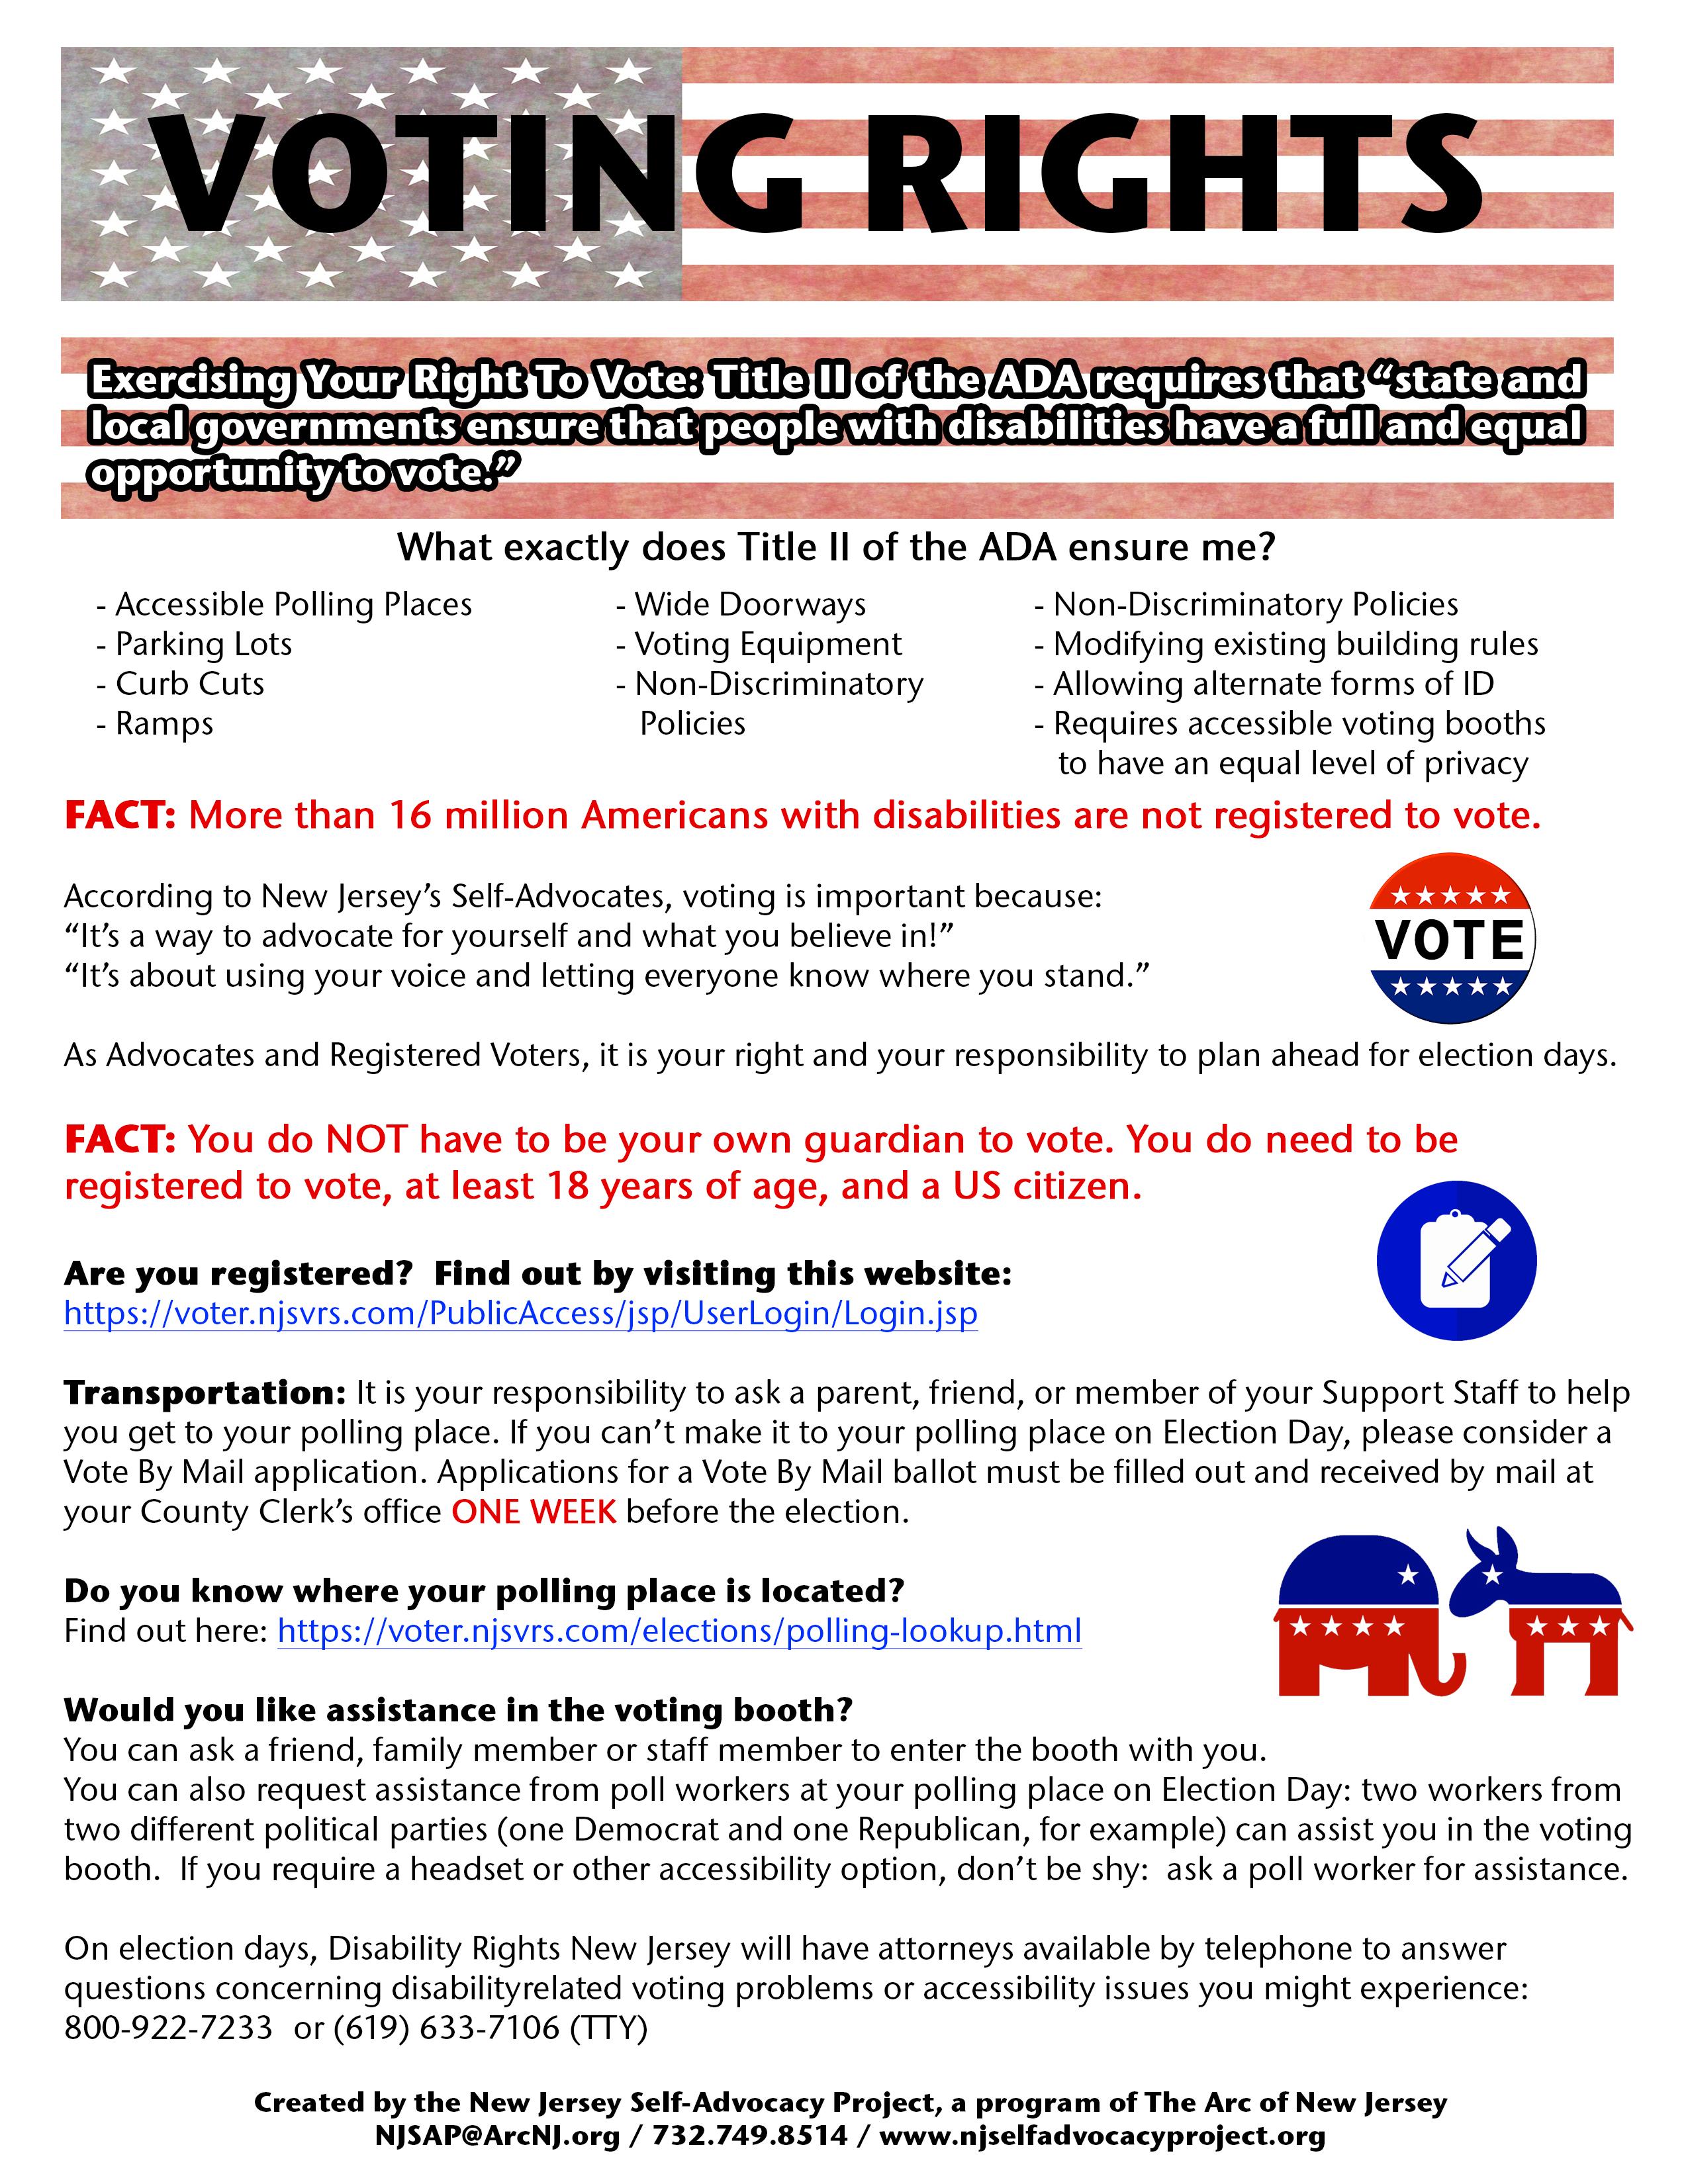 Voting Rights Factsheet